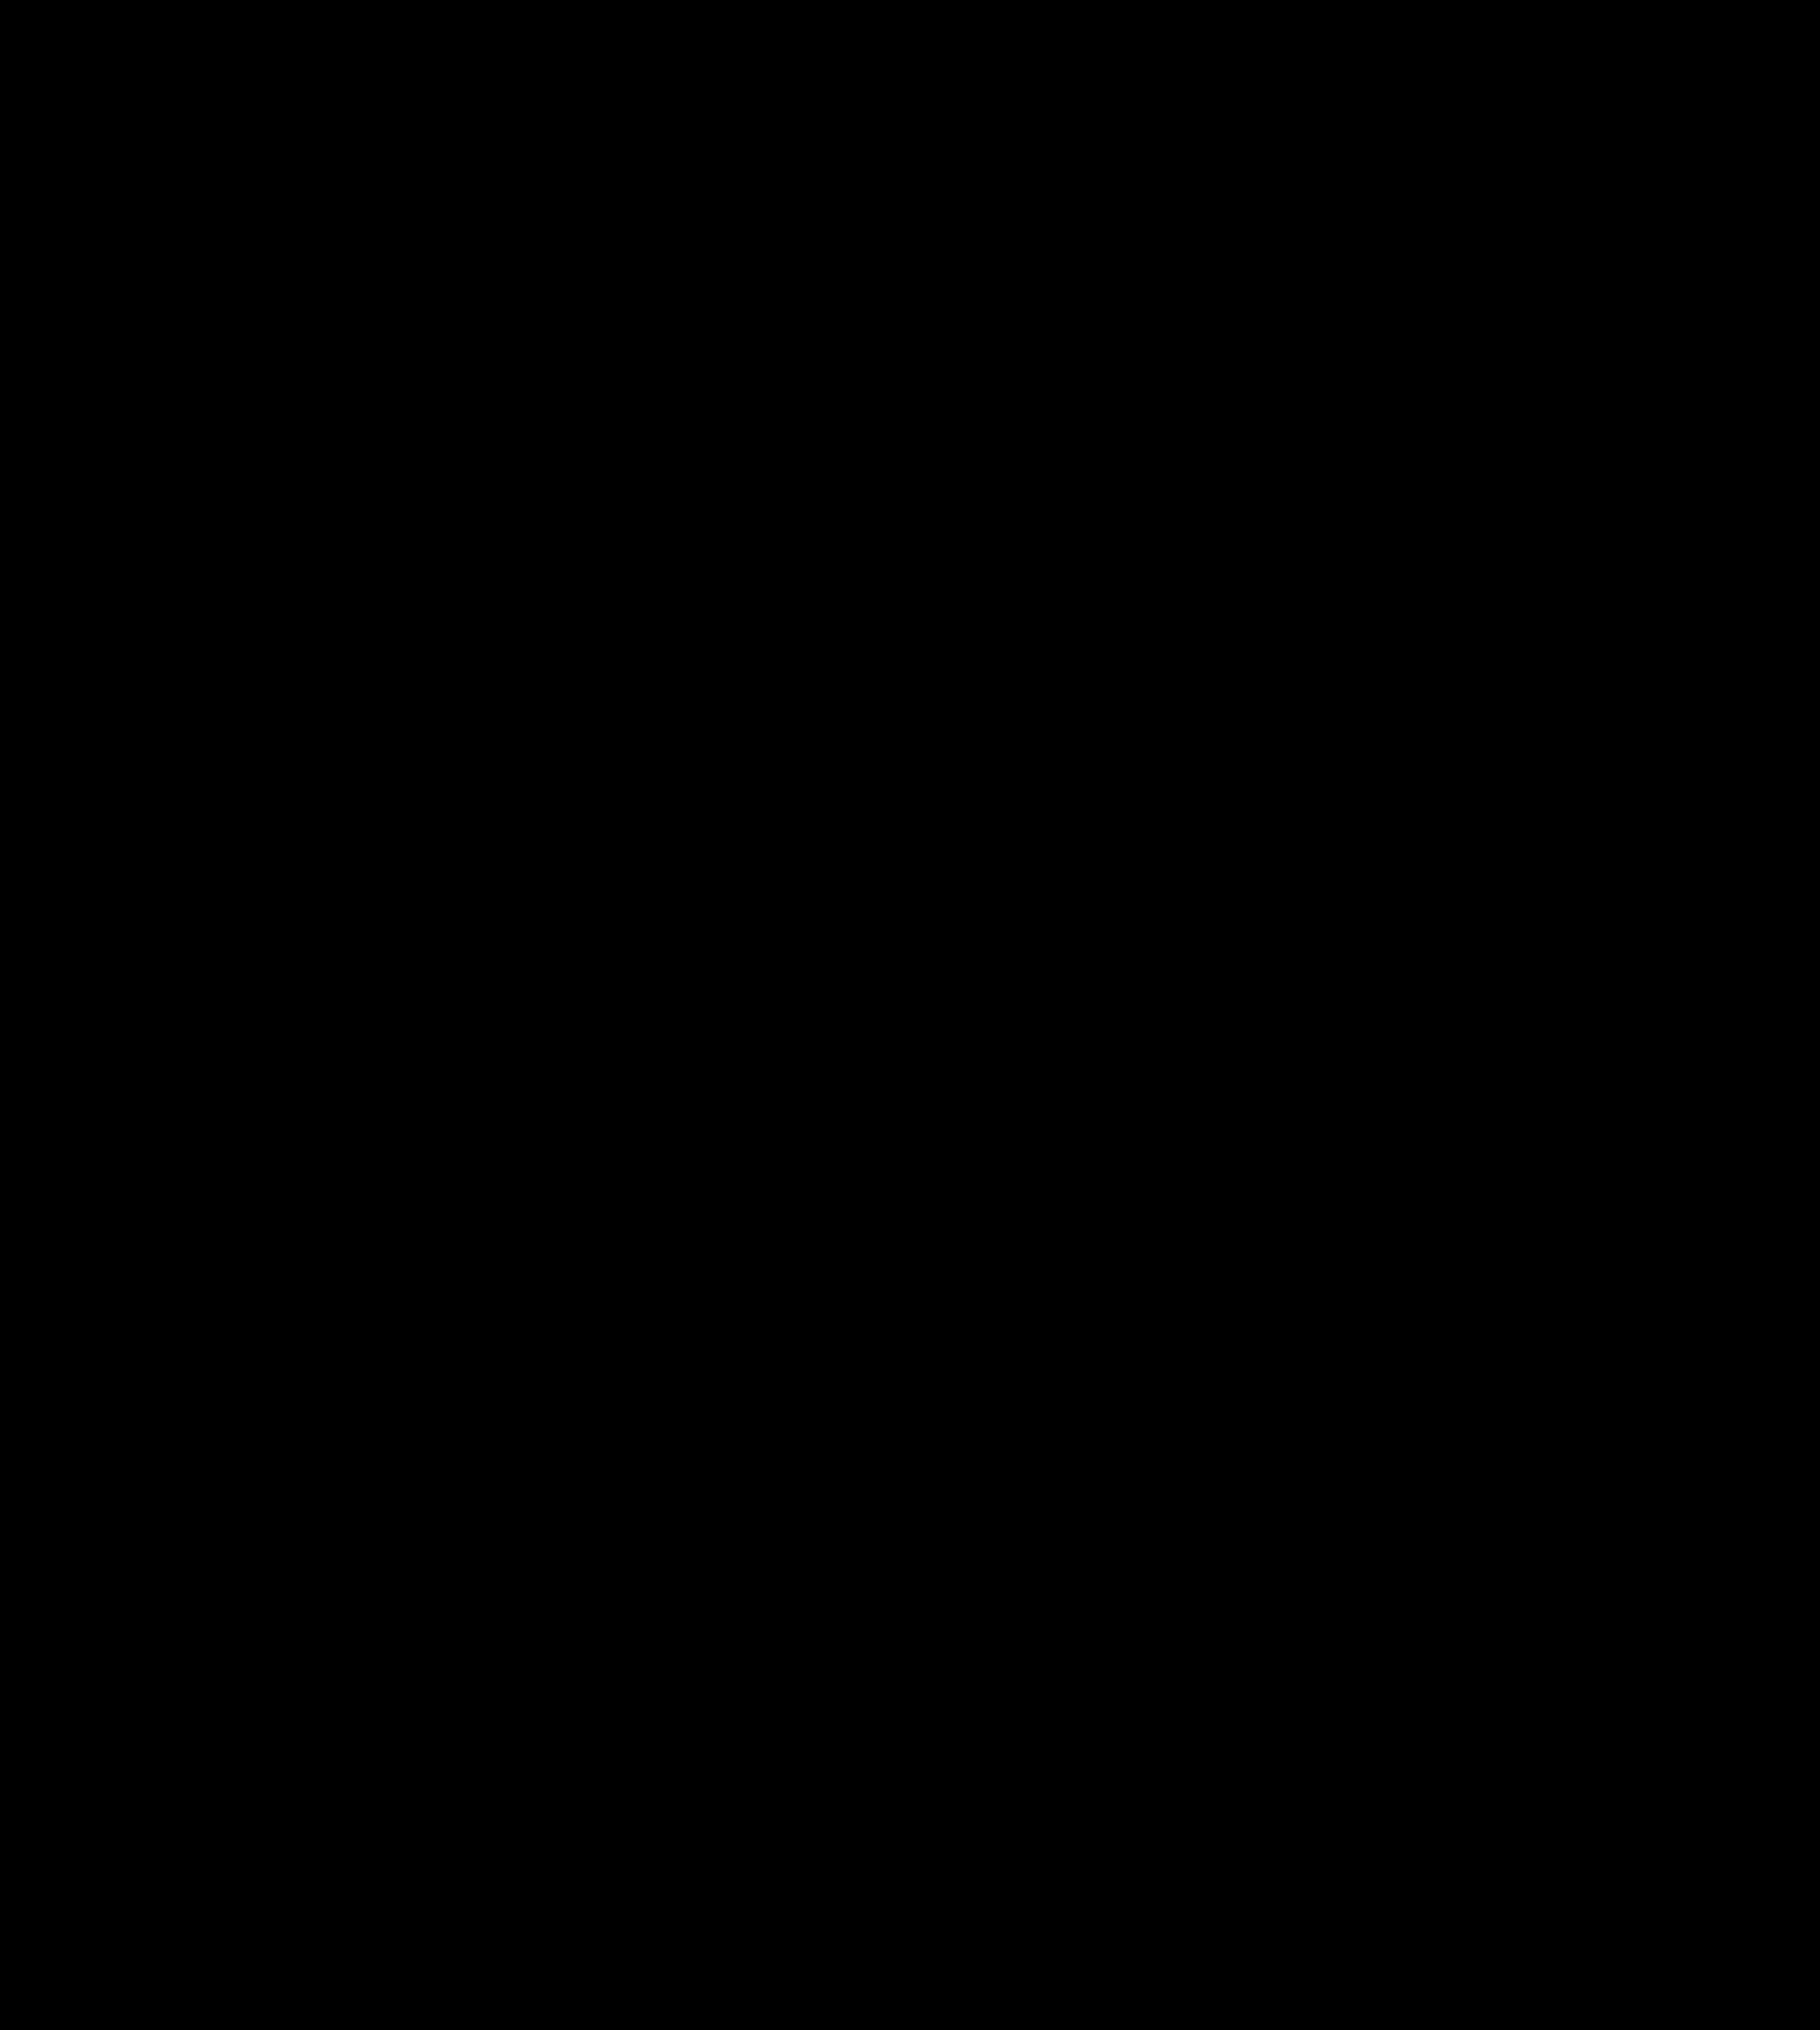 Big Image (Png) - Libra, Transparent background PNG HD thumbnail